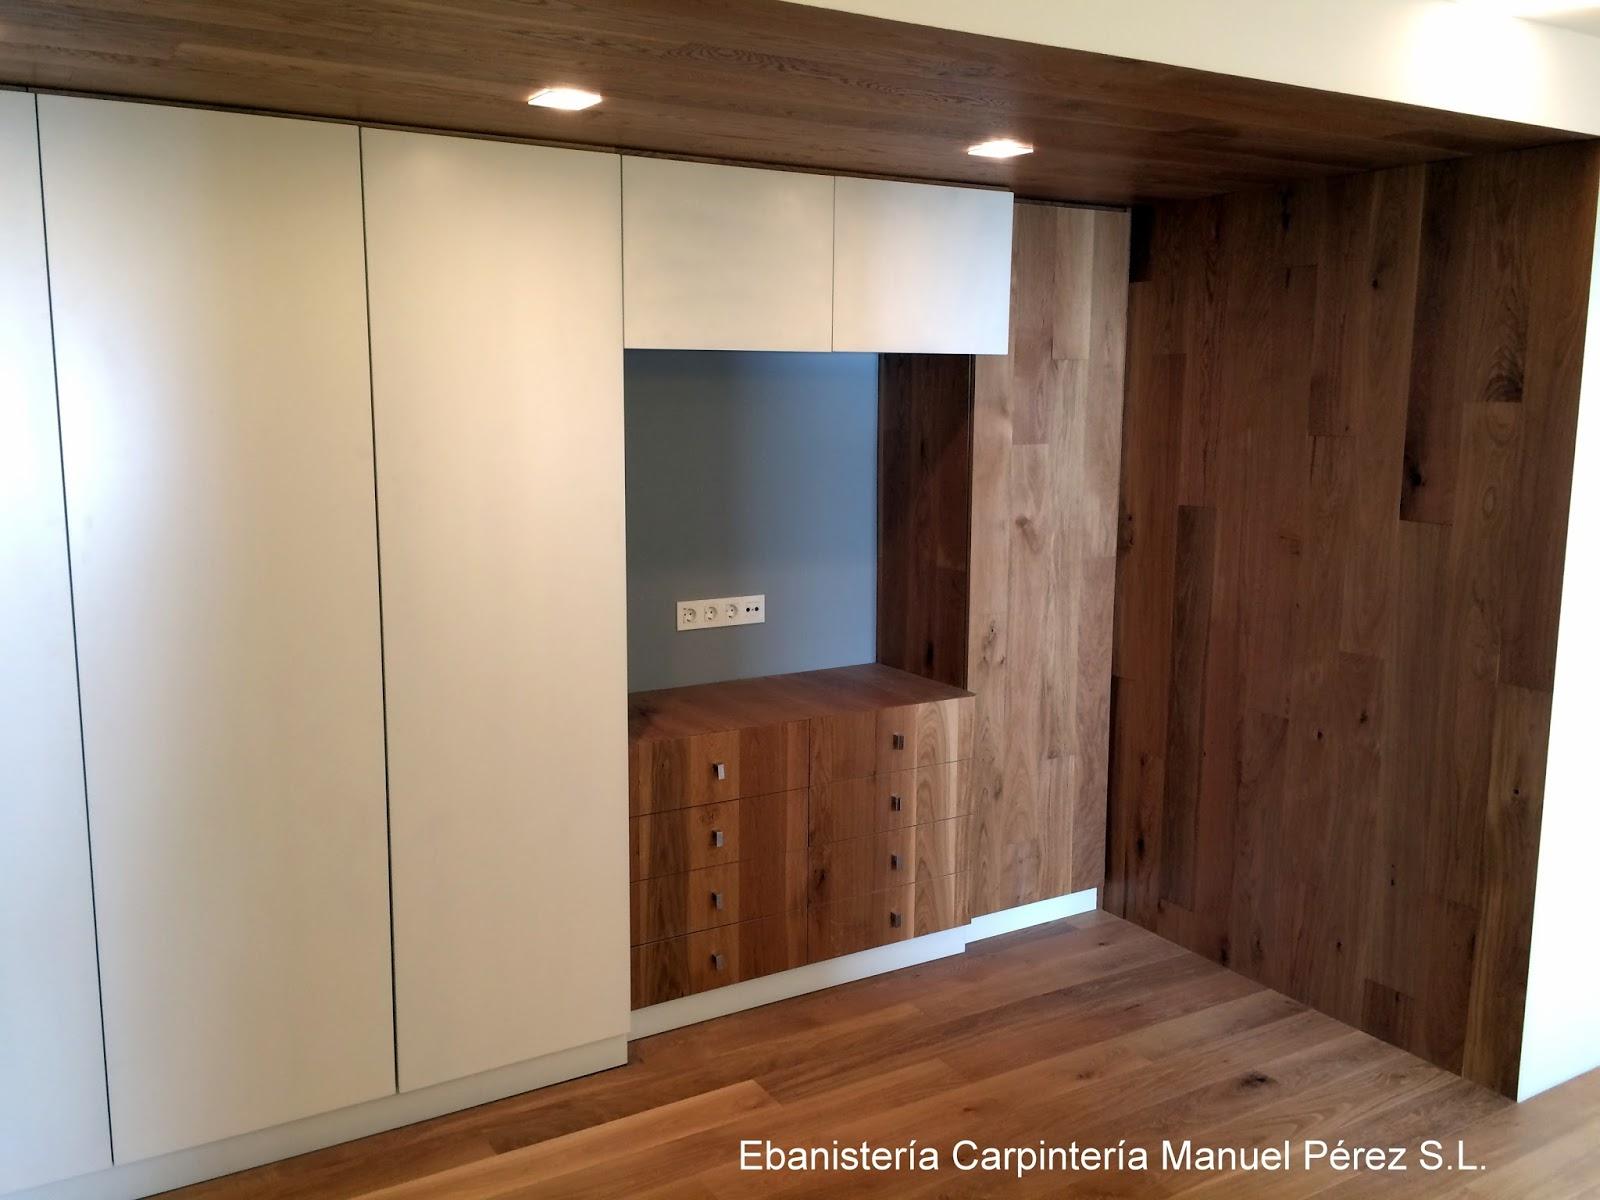 Ebanisteria carpinteria manuel perez zaragoza mueble for Mueble tv dormitorio